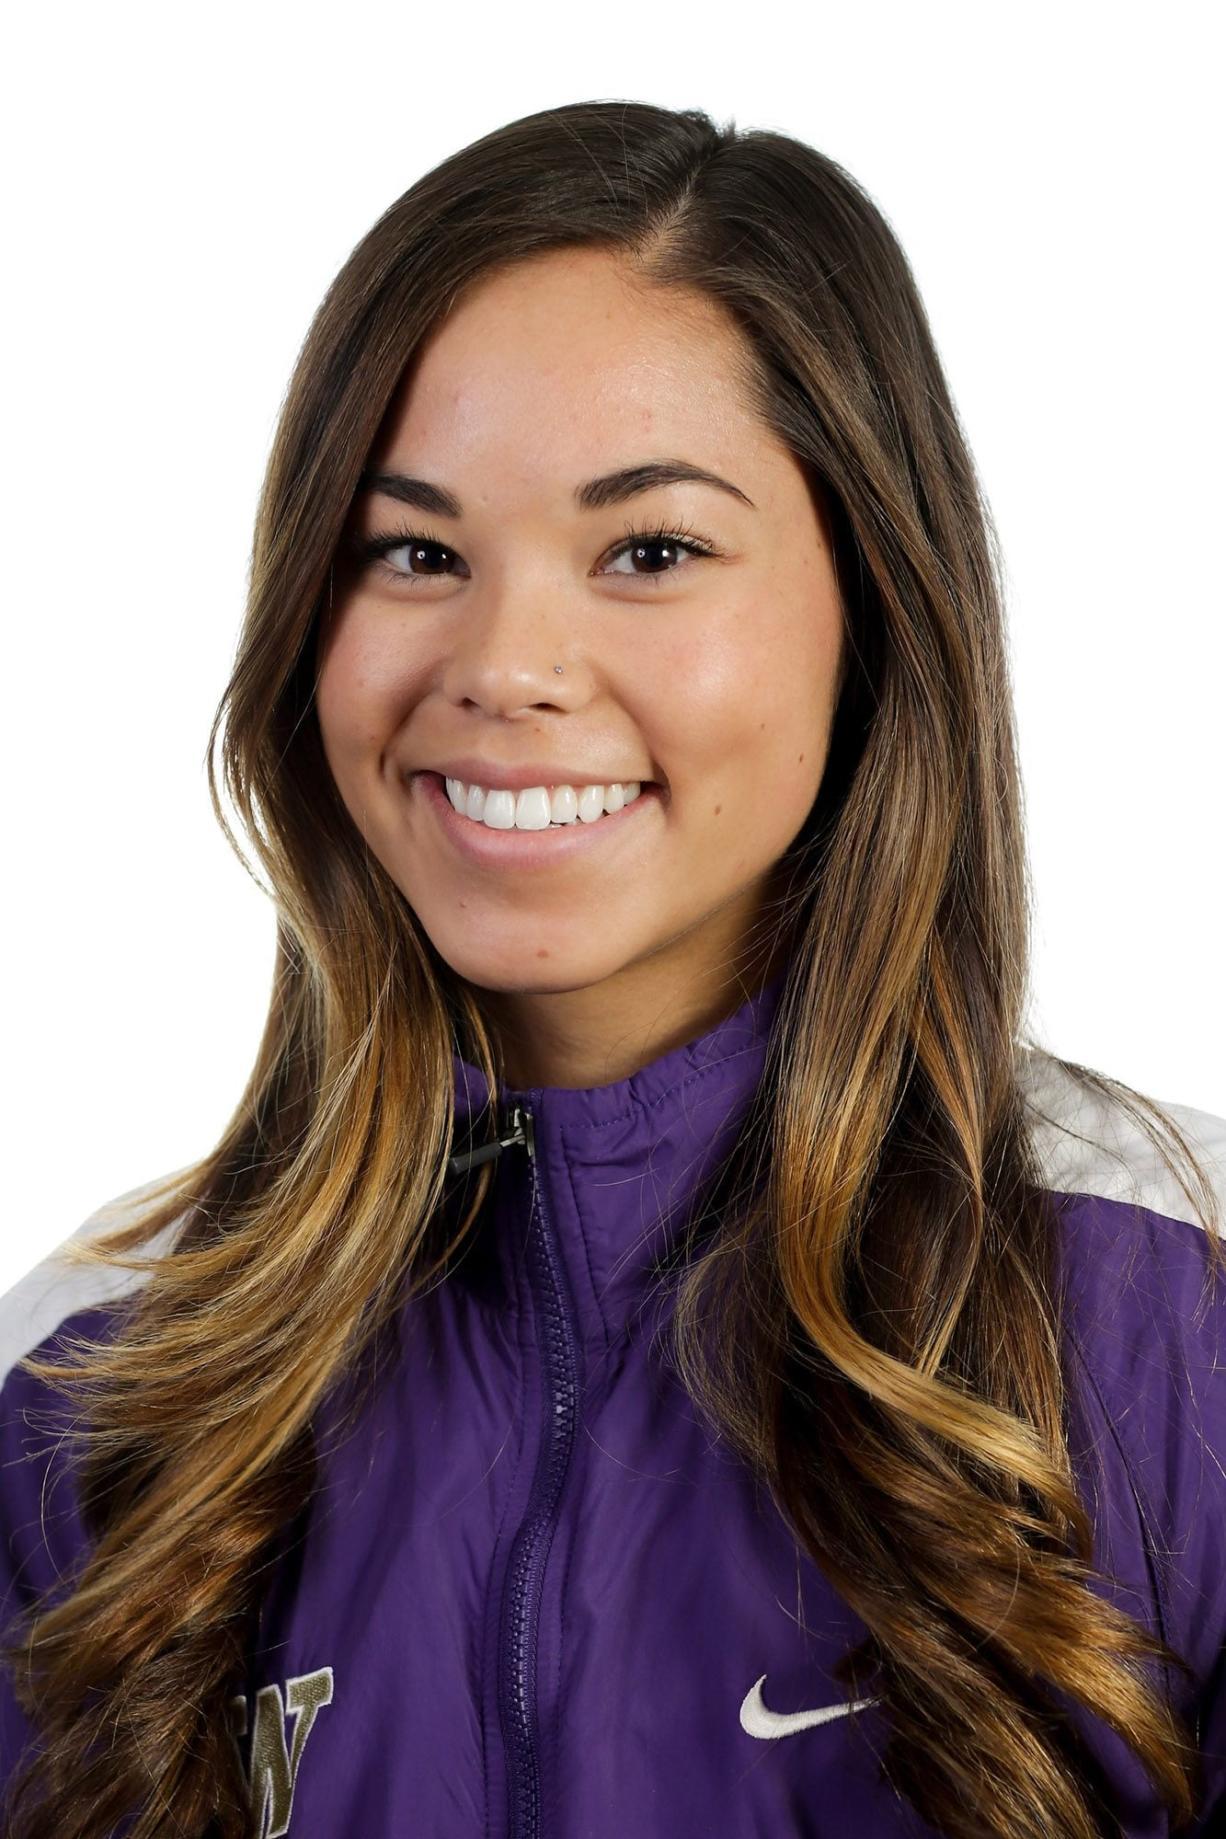 Kristina Owsinski, University of Washington track and field.